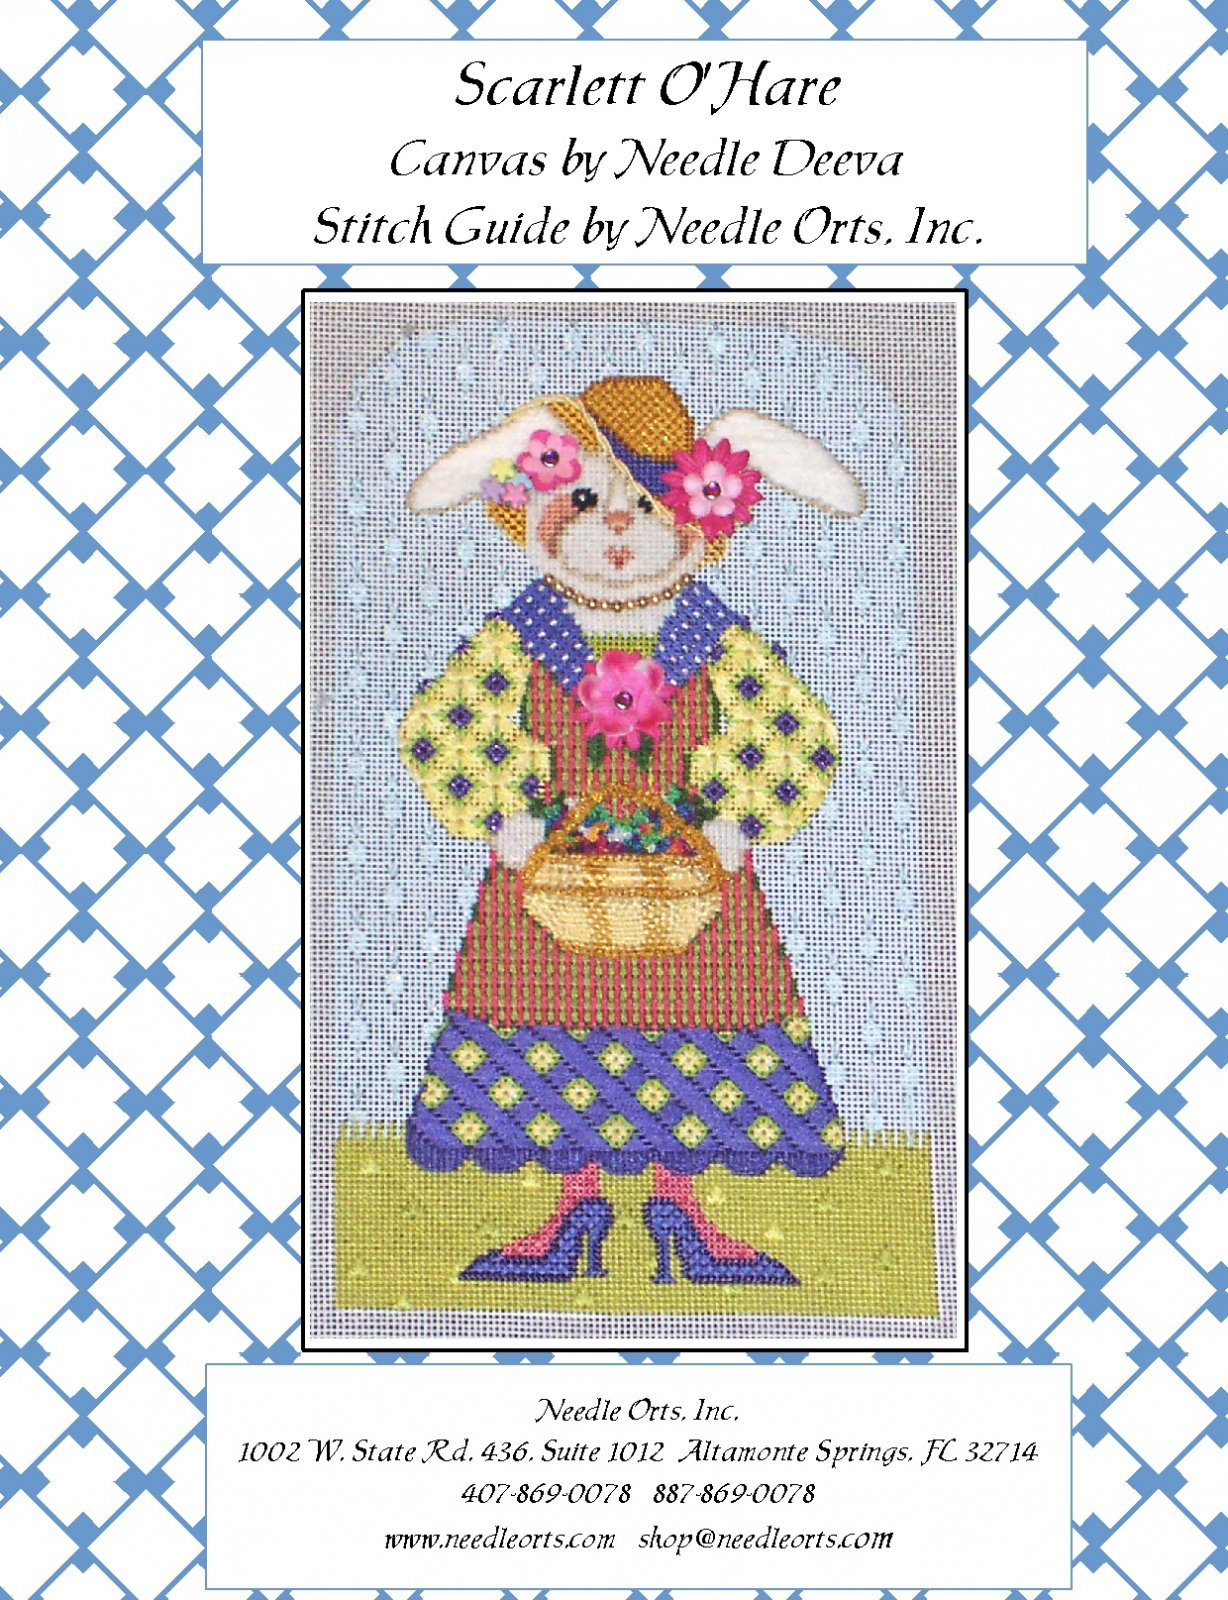 Stitch Guide - Scarlett O'Hare